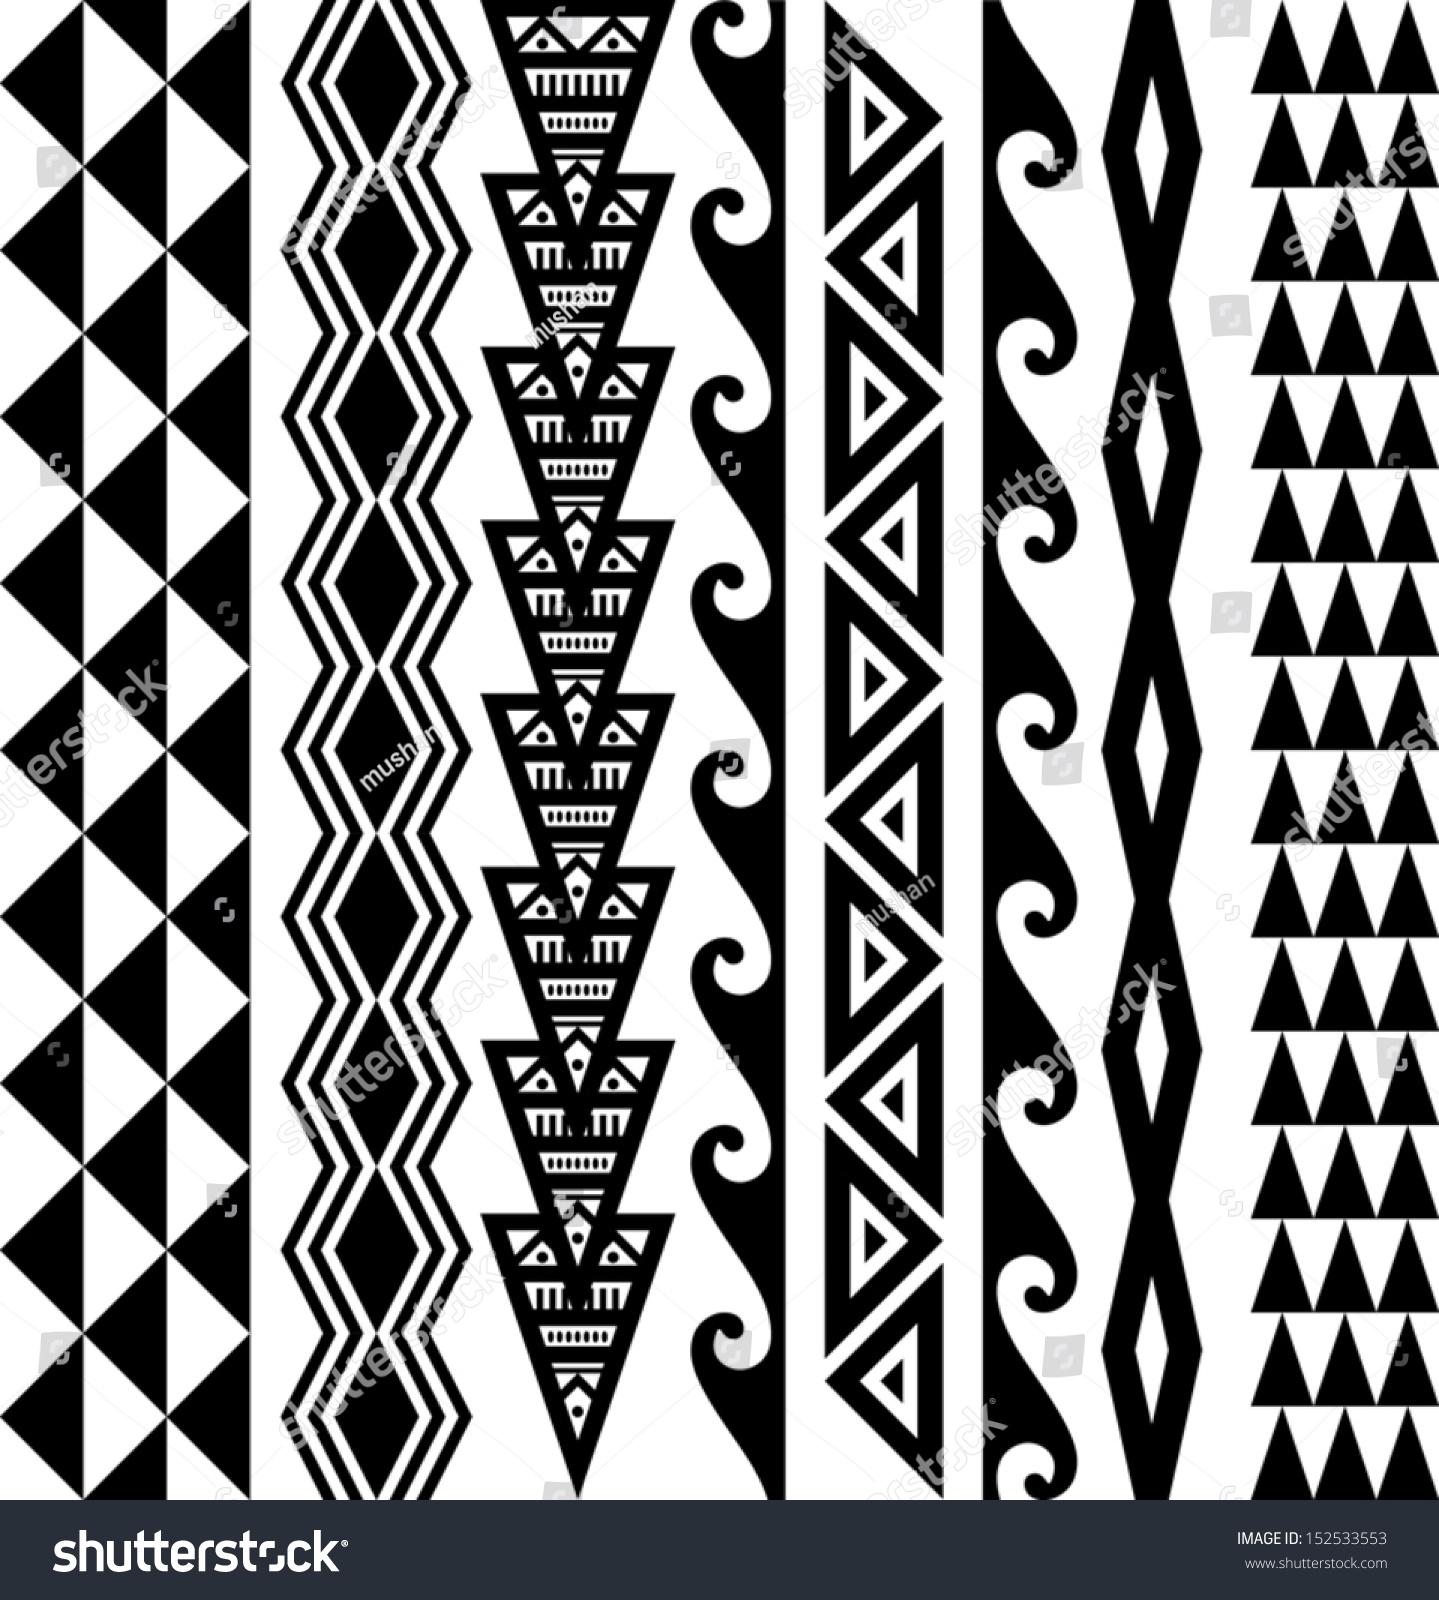 royalty free kakau hawaiian tattoo collection 152533553. Black Bedroom Furniture Sets. Home Design Ideas